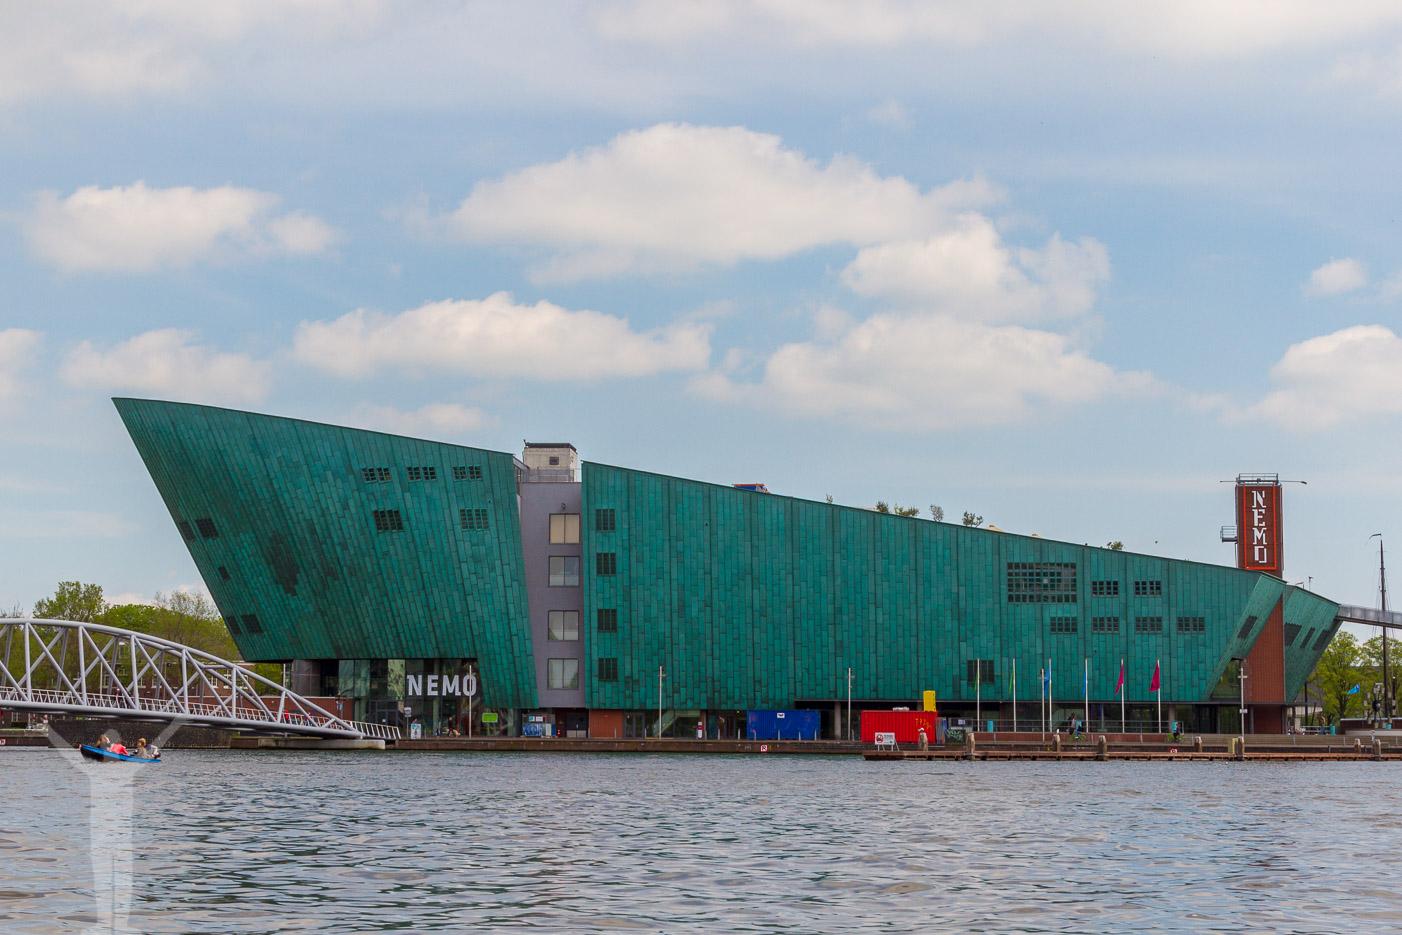 Nemo i Amsterdam